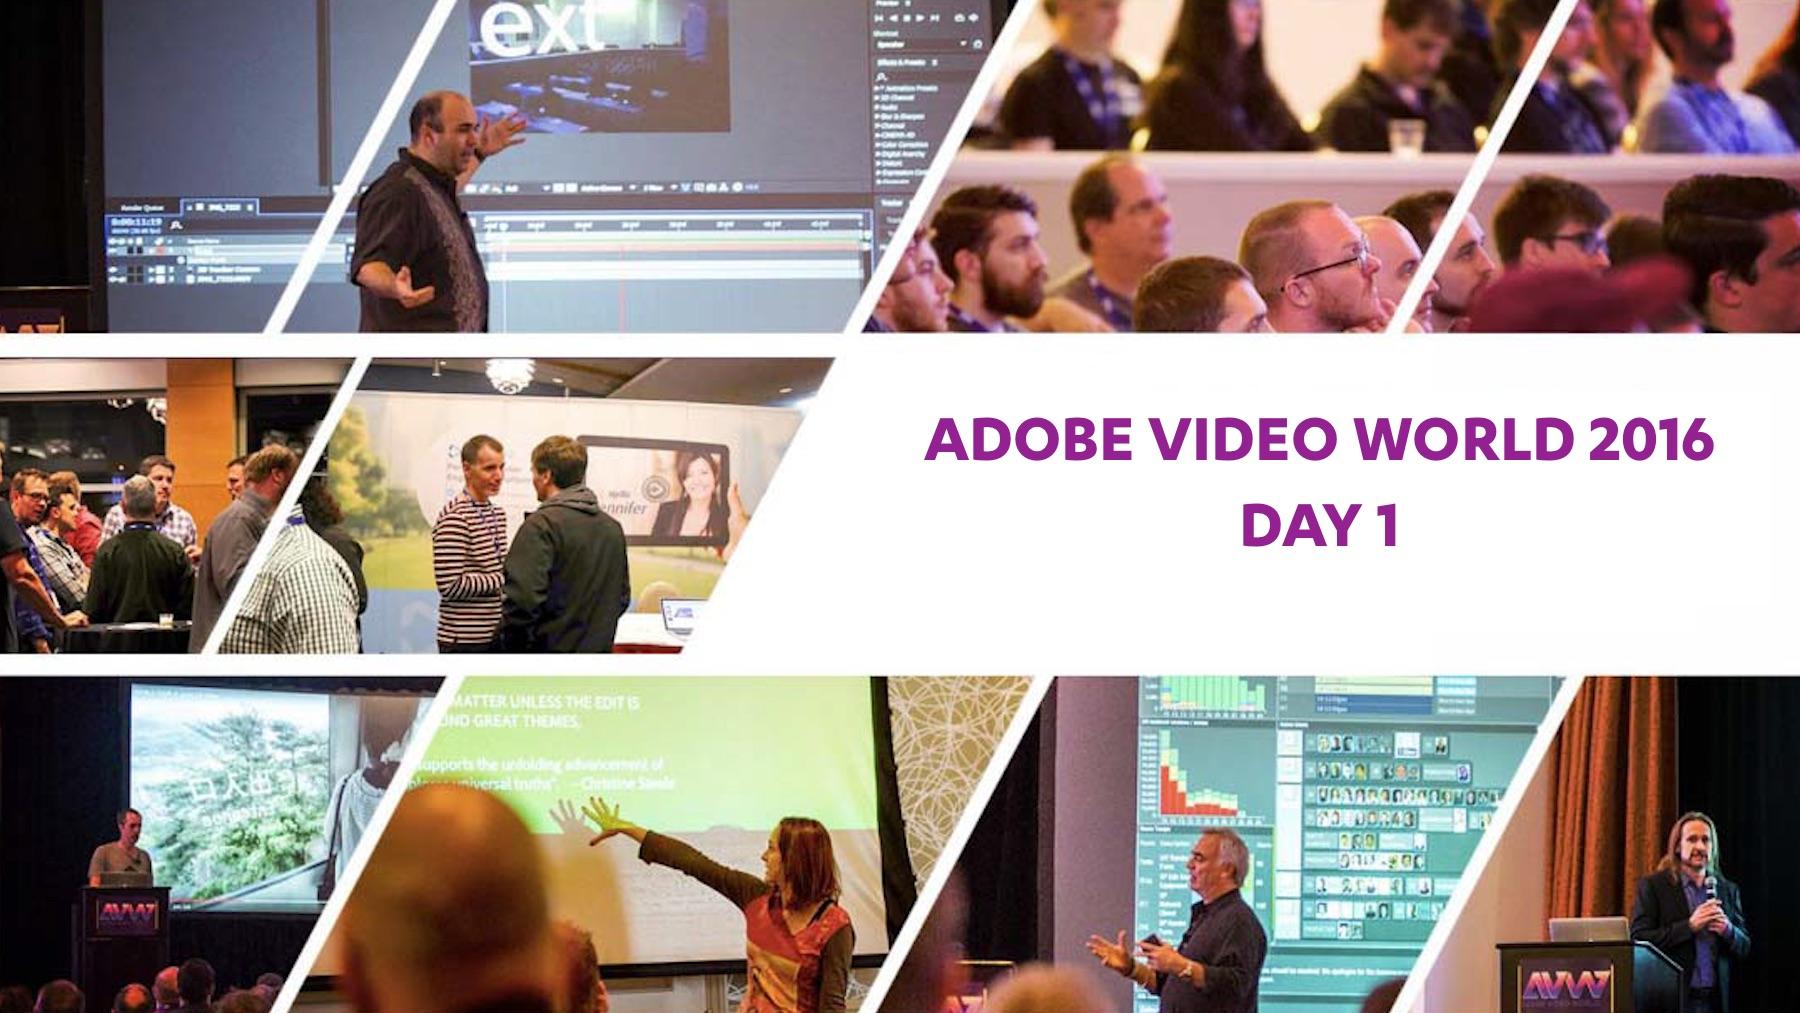 adobe-video-world-2016-day-1.png